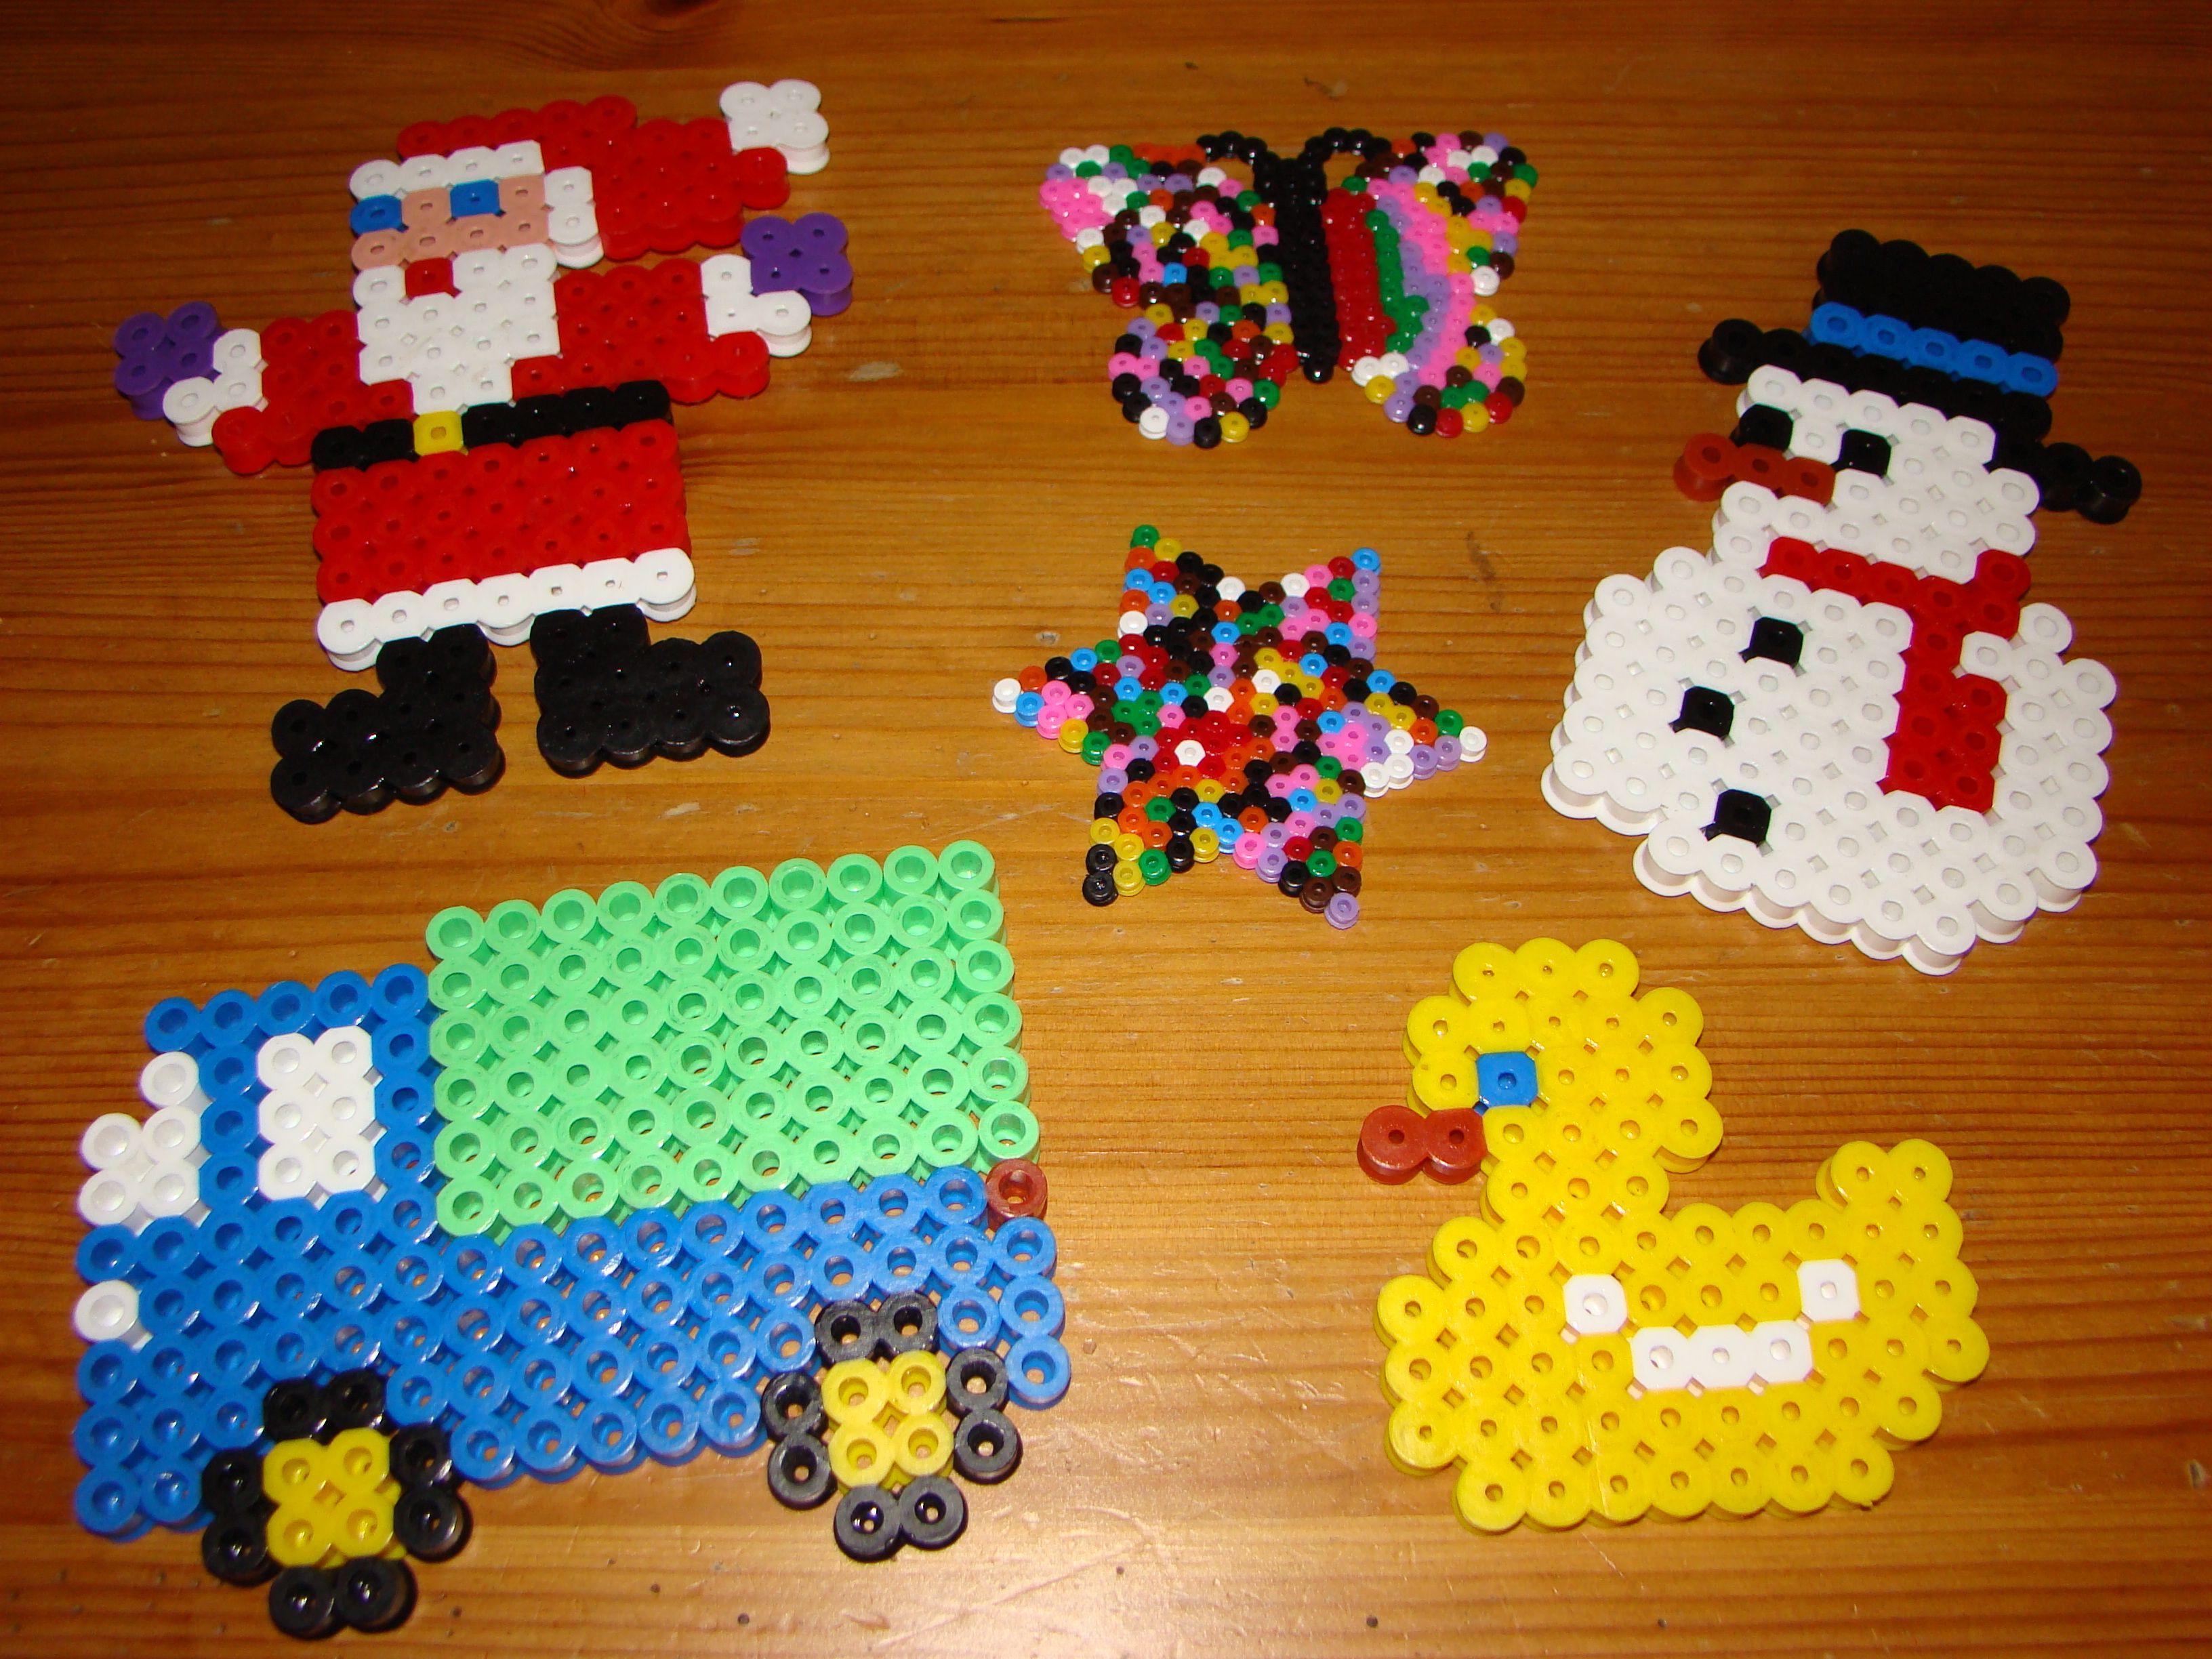 Hama Beads | Hama beads design, Hama beads and Beads